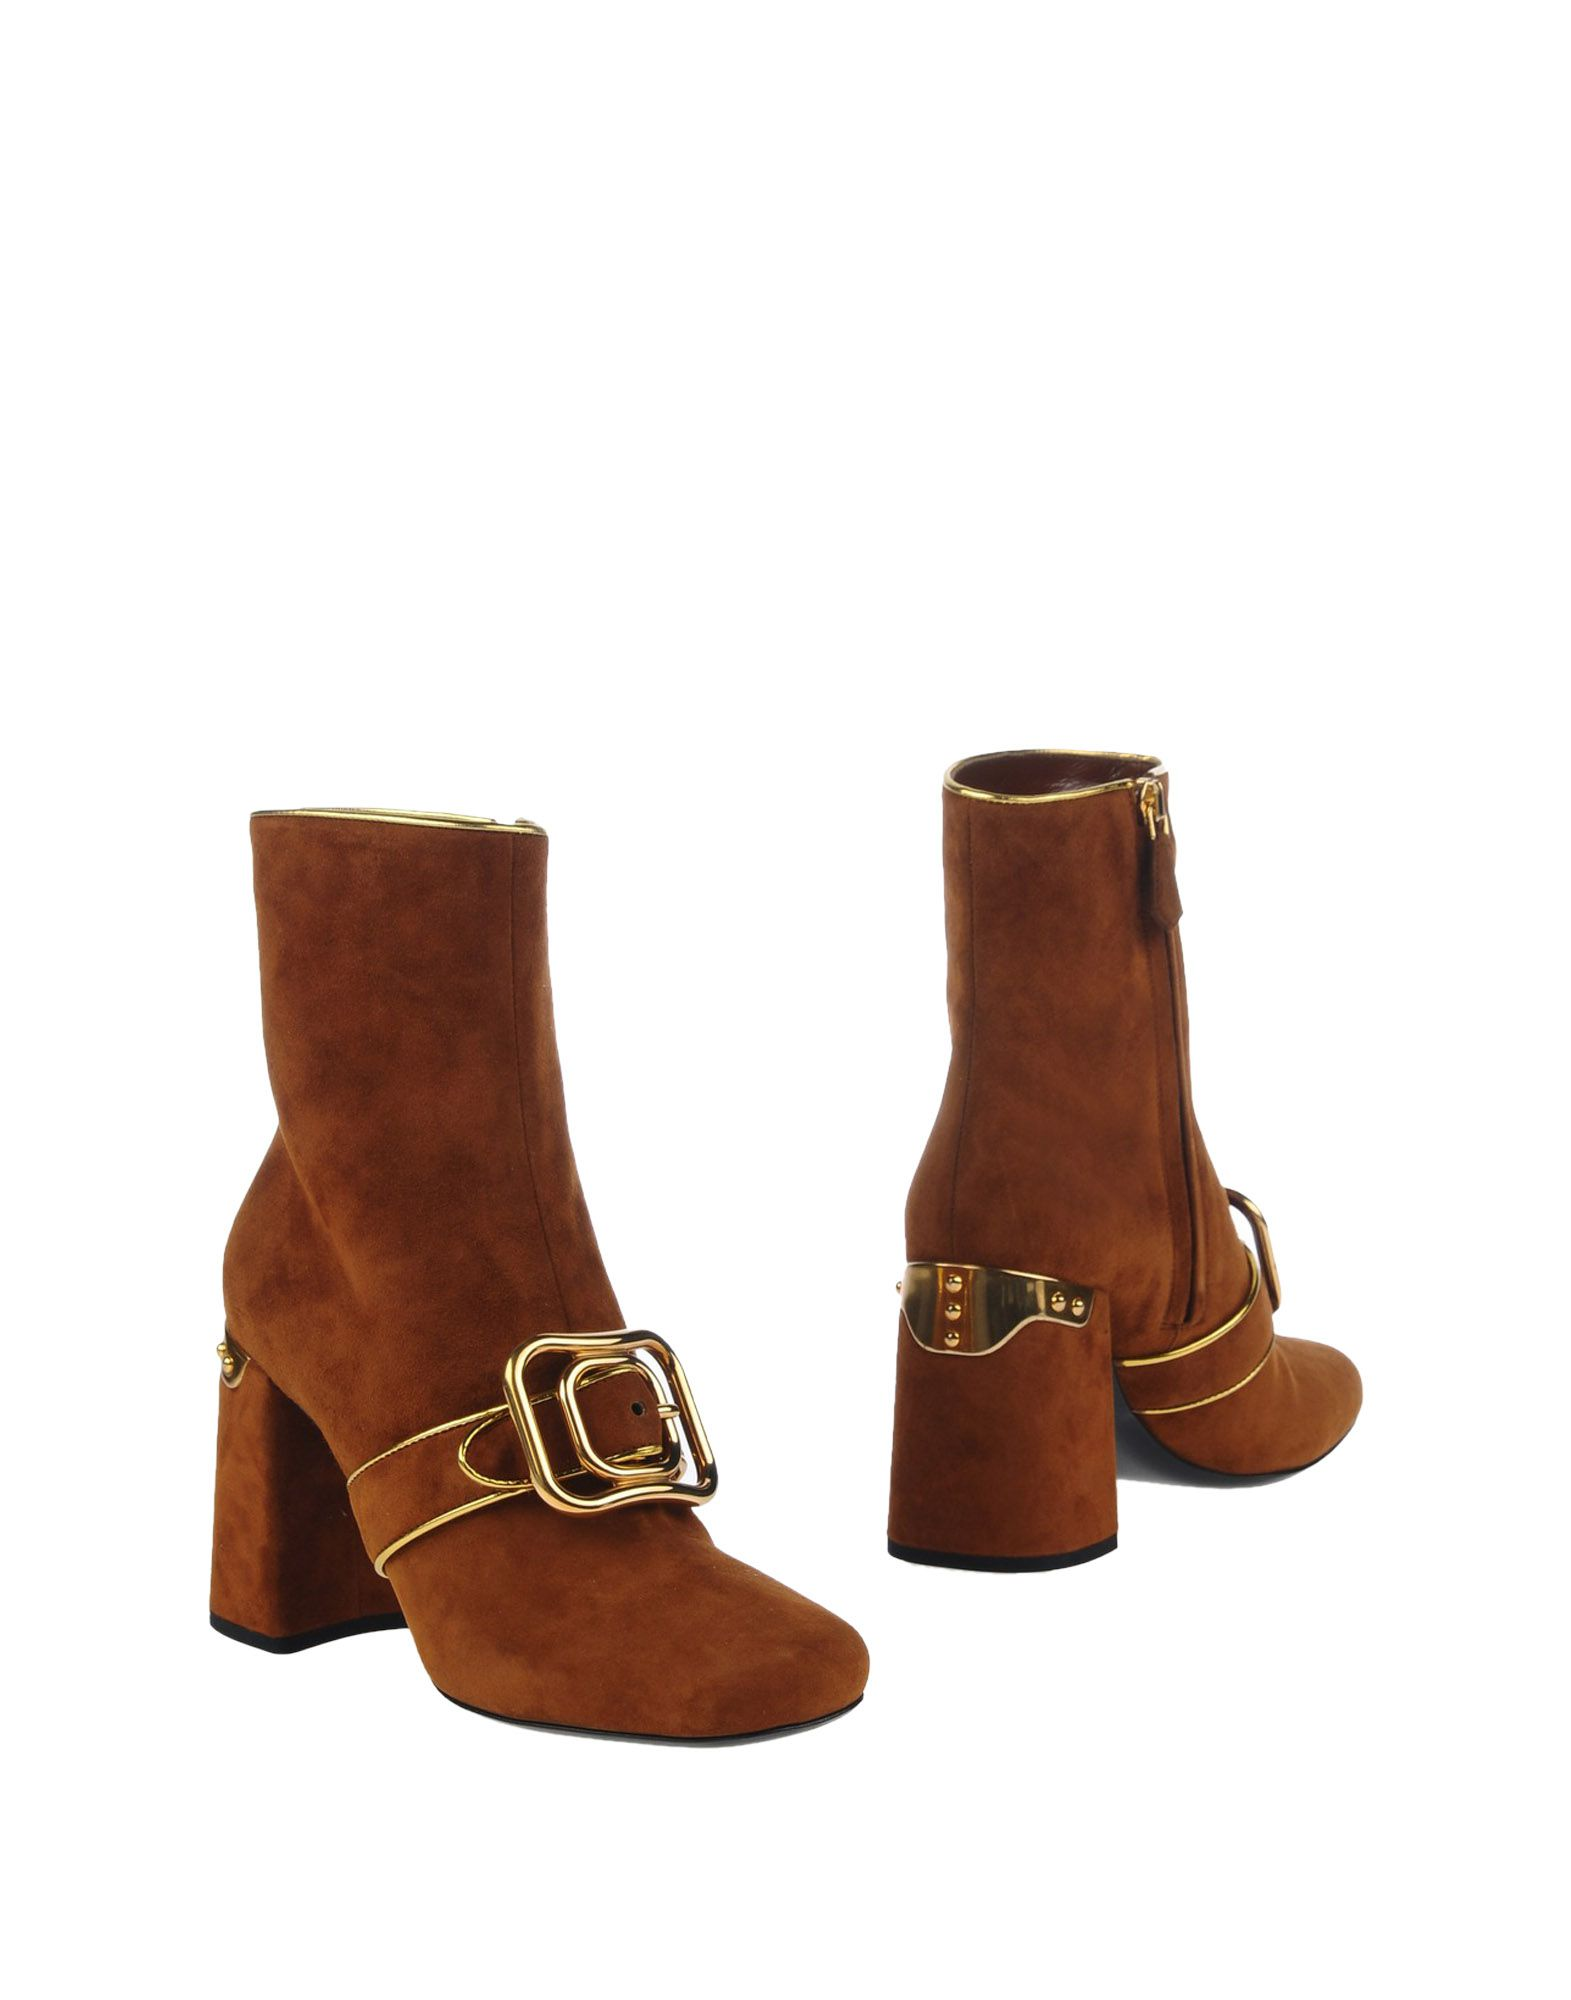 Bottine Prada Femme - Bottines Prada Camel Remise de marque